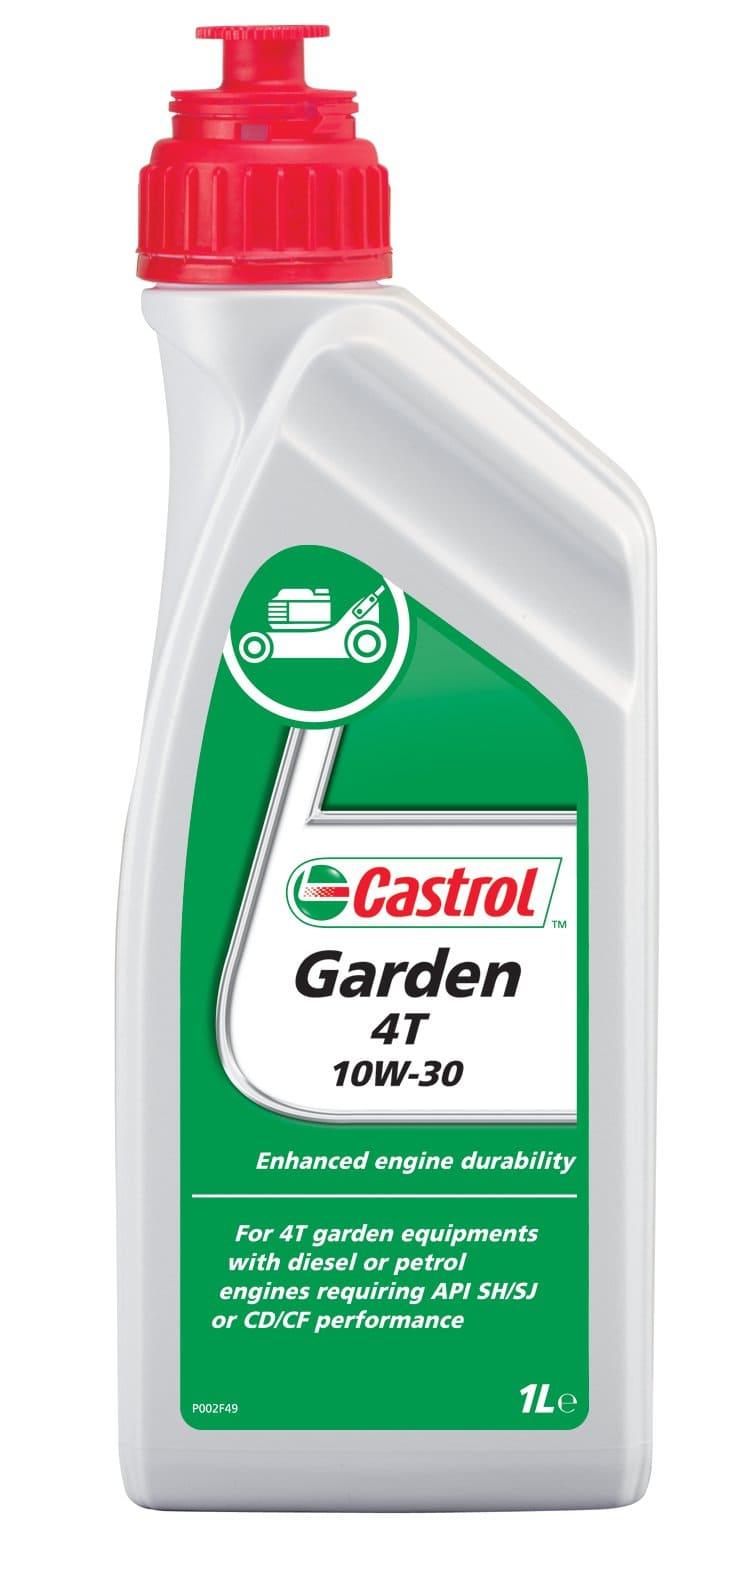 Castrol Garden 4T 10W-30 1 L Olio motore